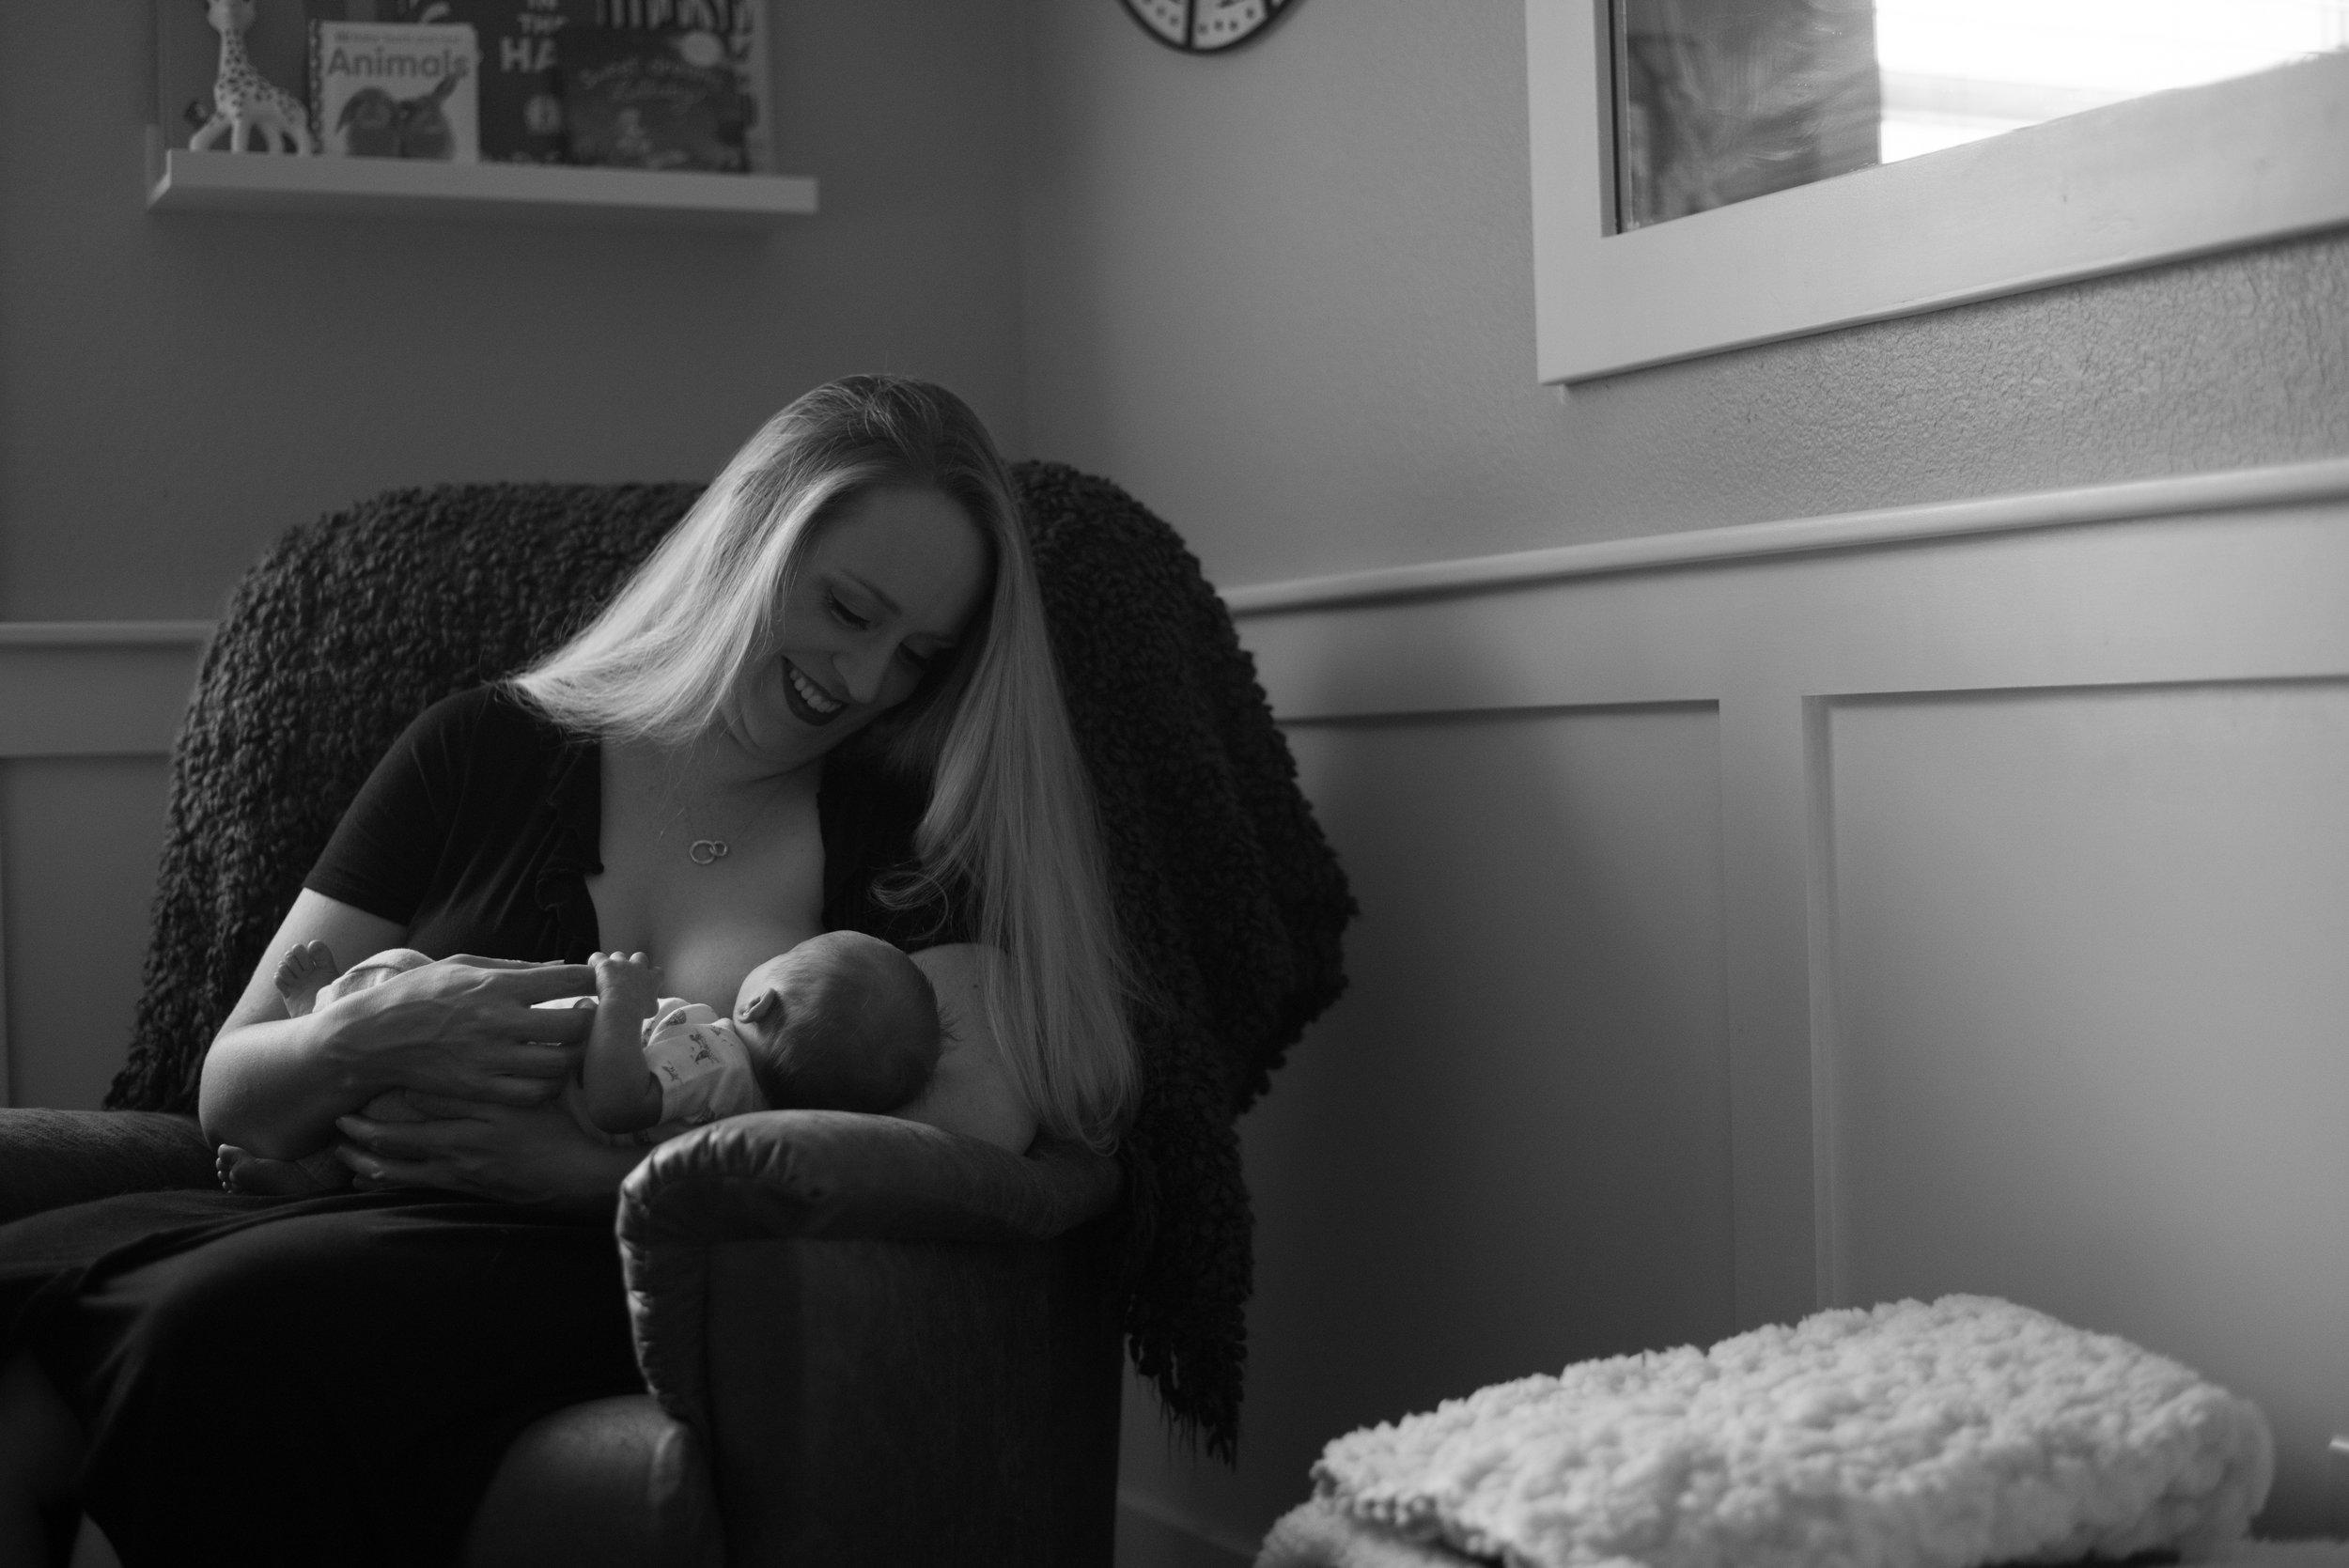 mothers love, breastfeeding awareness, 31 days 31 stories